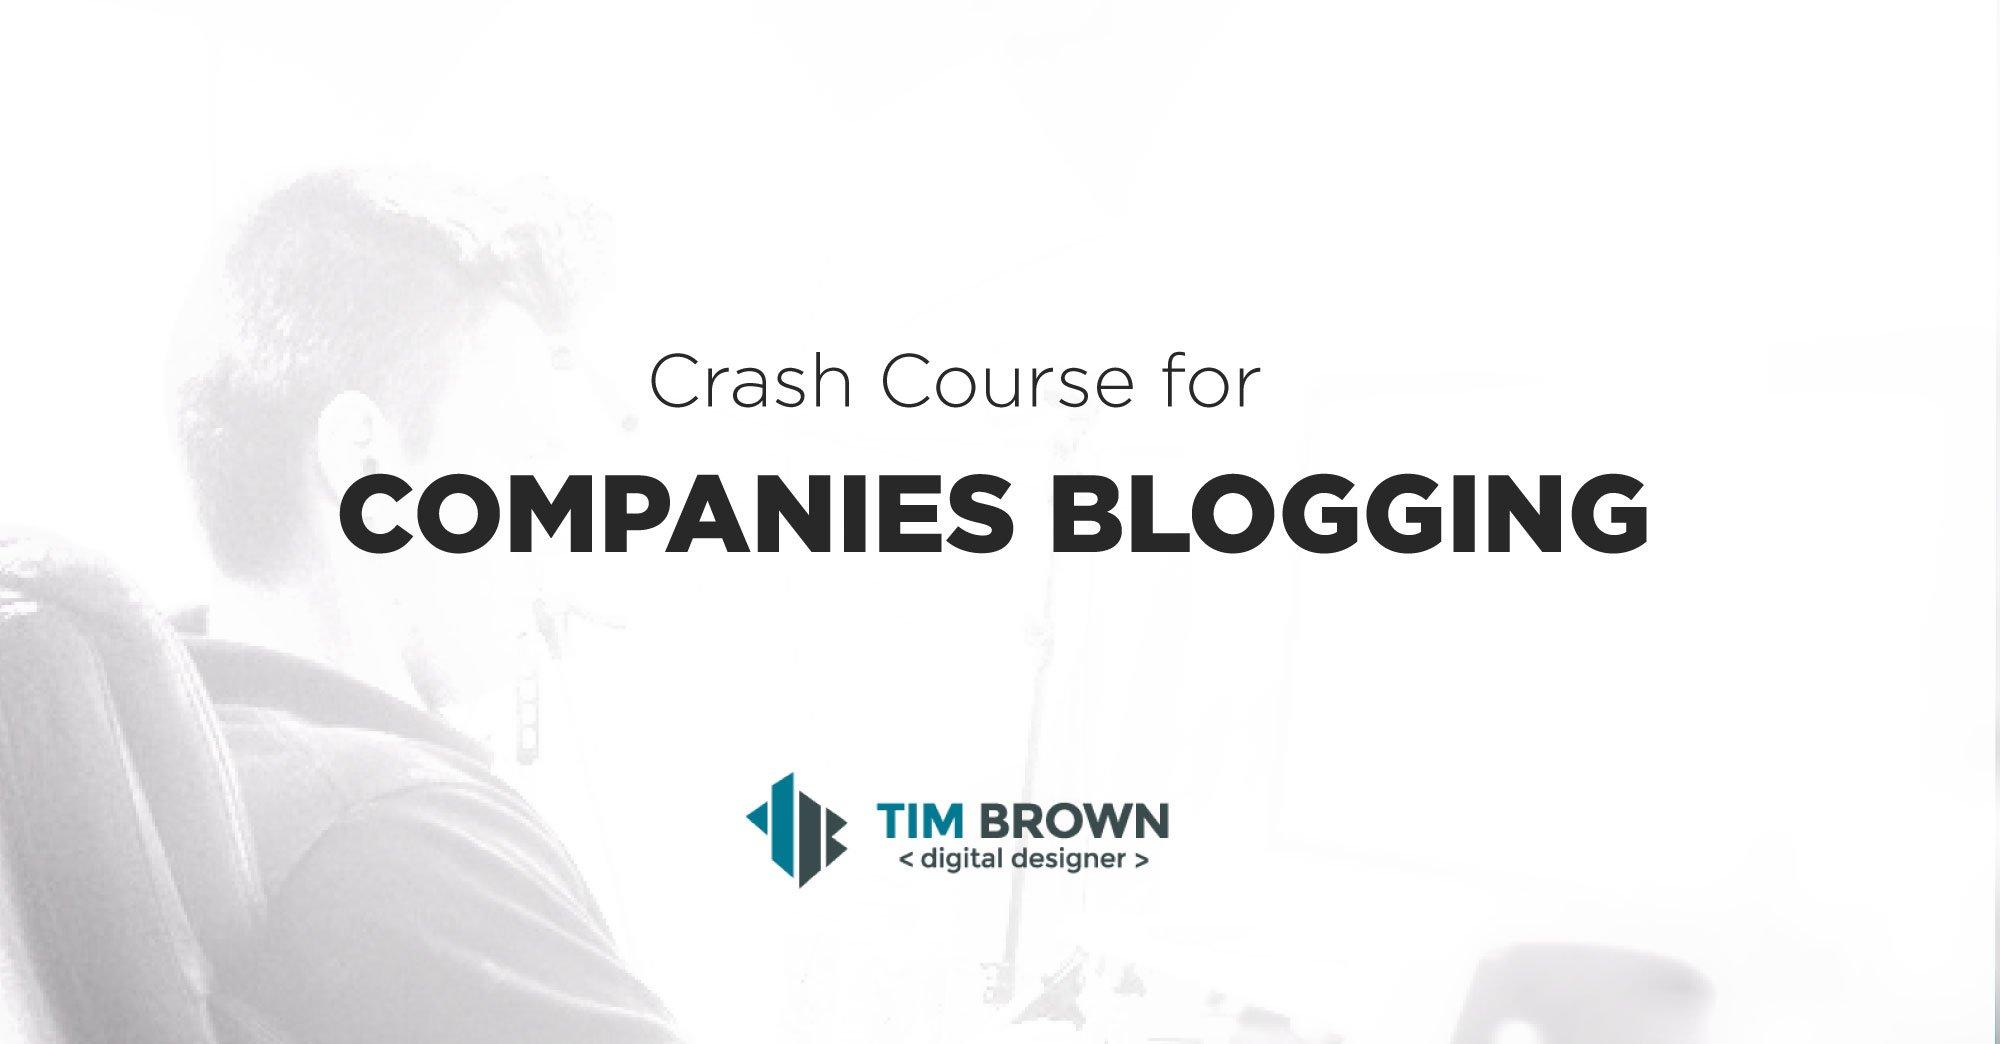 Crash course for Companies Blogging – Blogging for Business